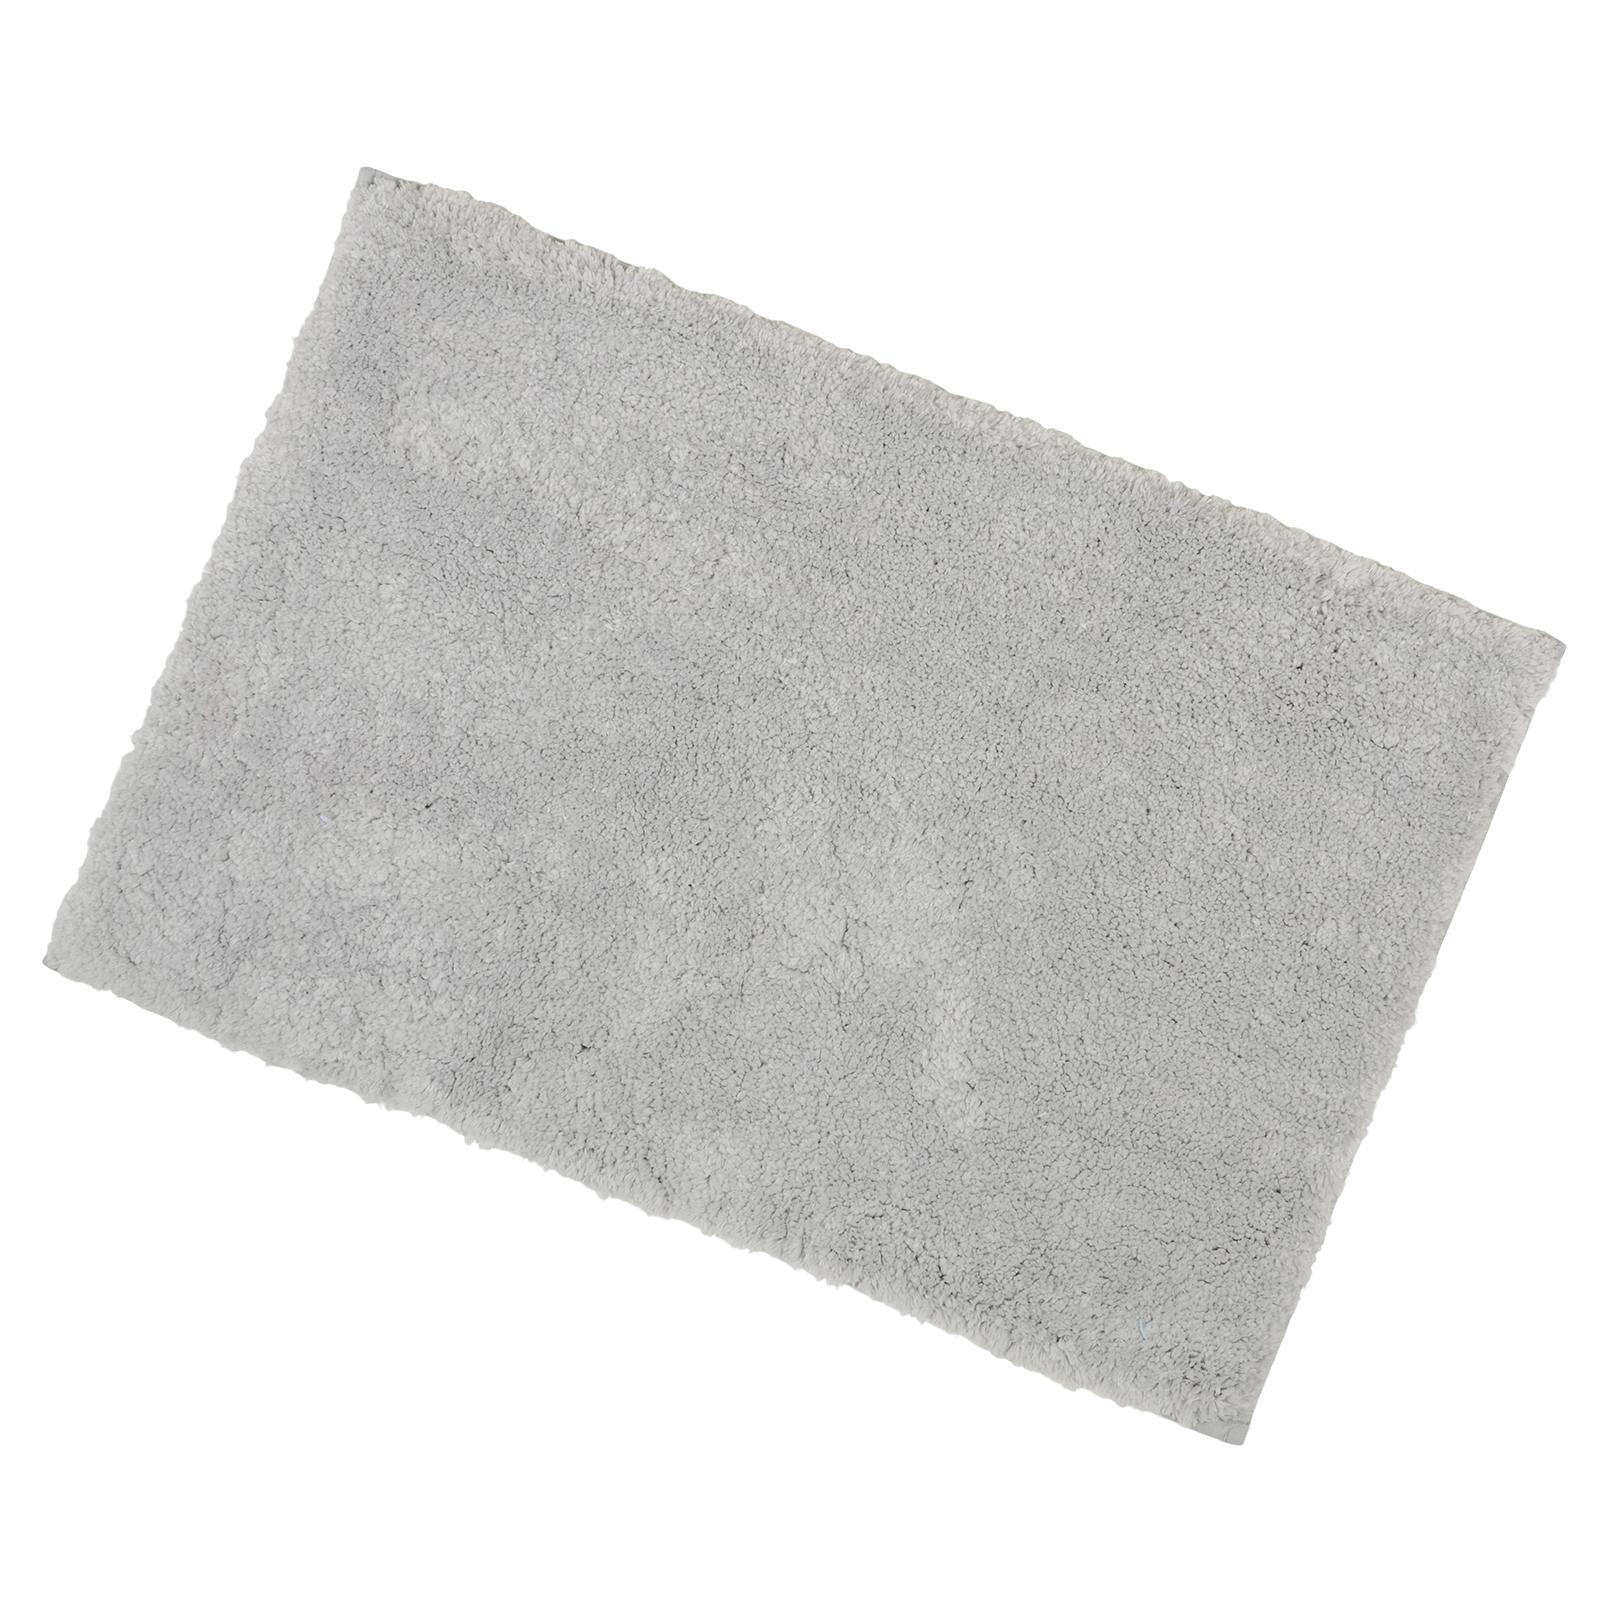 40x60cm Grey Tufted Microfibre Shower Bath Mat Rug Non Slip Backing Bamboobliss